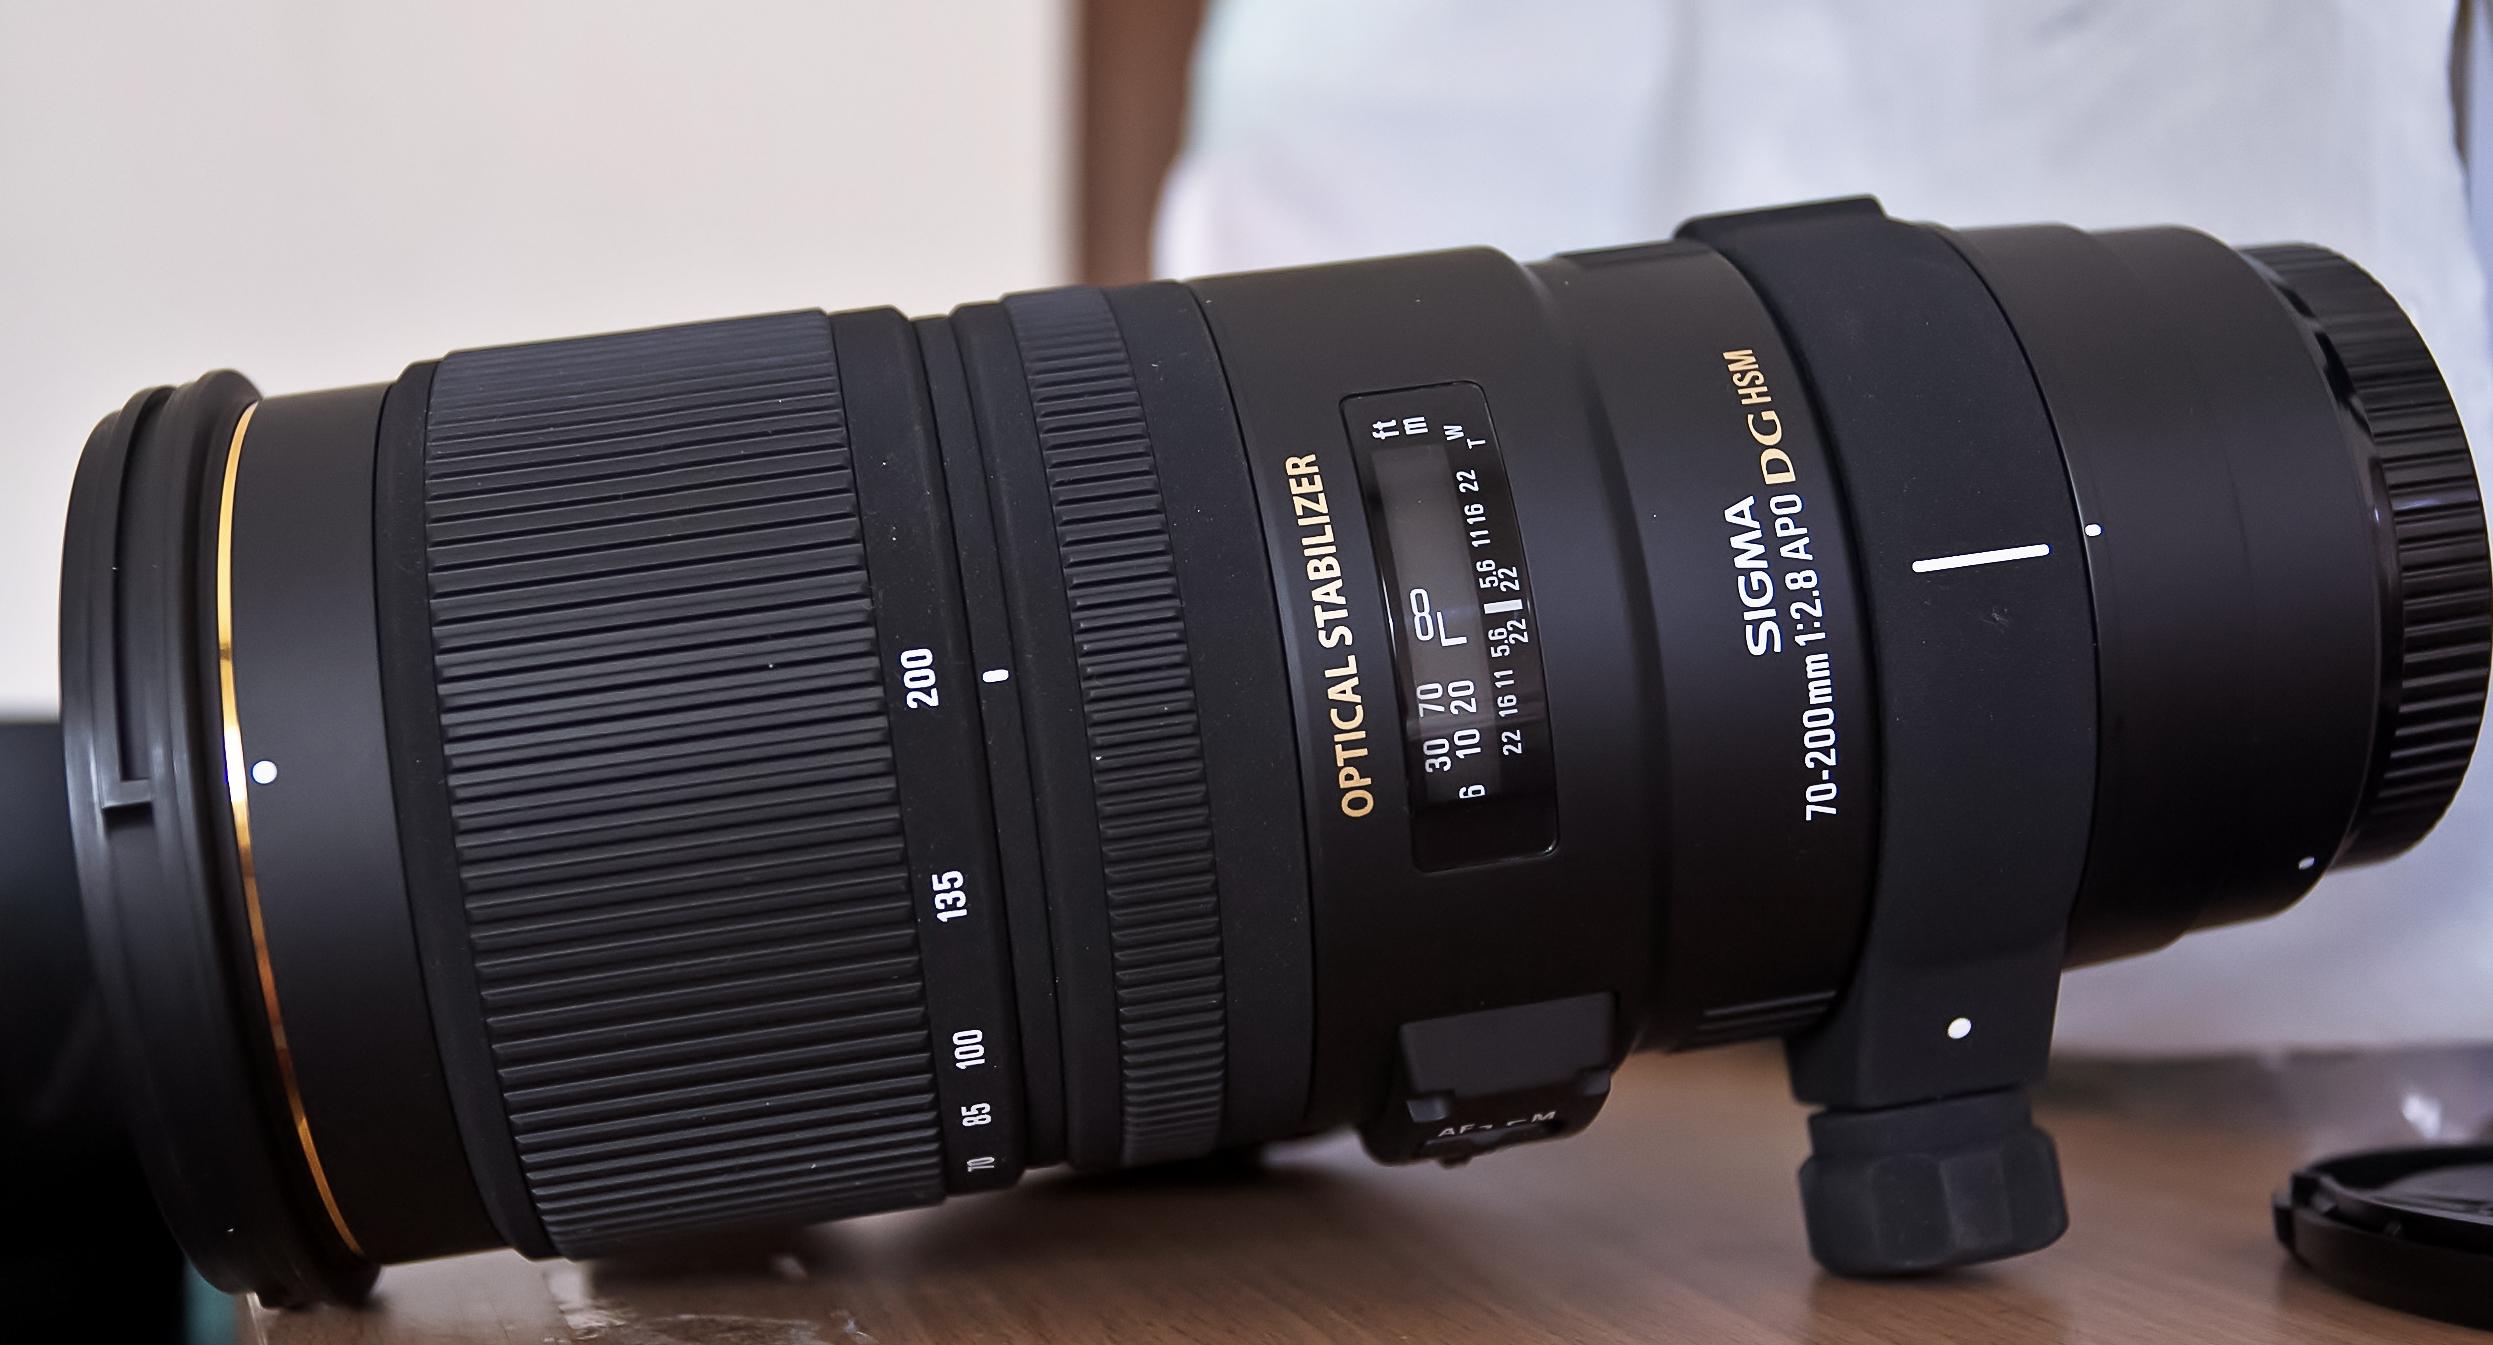 28f95f17e7cfd Sigma 70-200mm f 2.8 EX DG OS HSM lens - Wikipedia